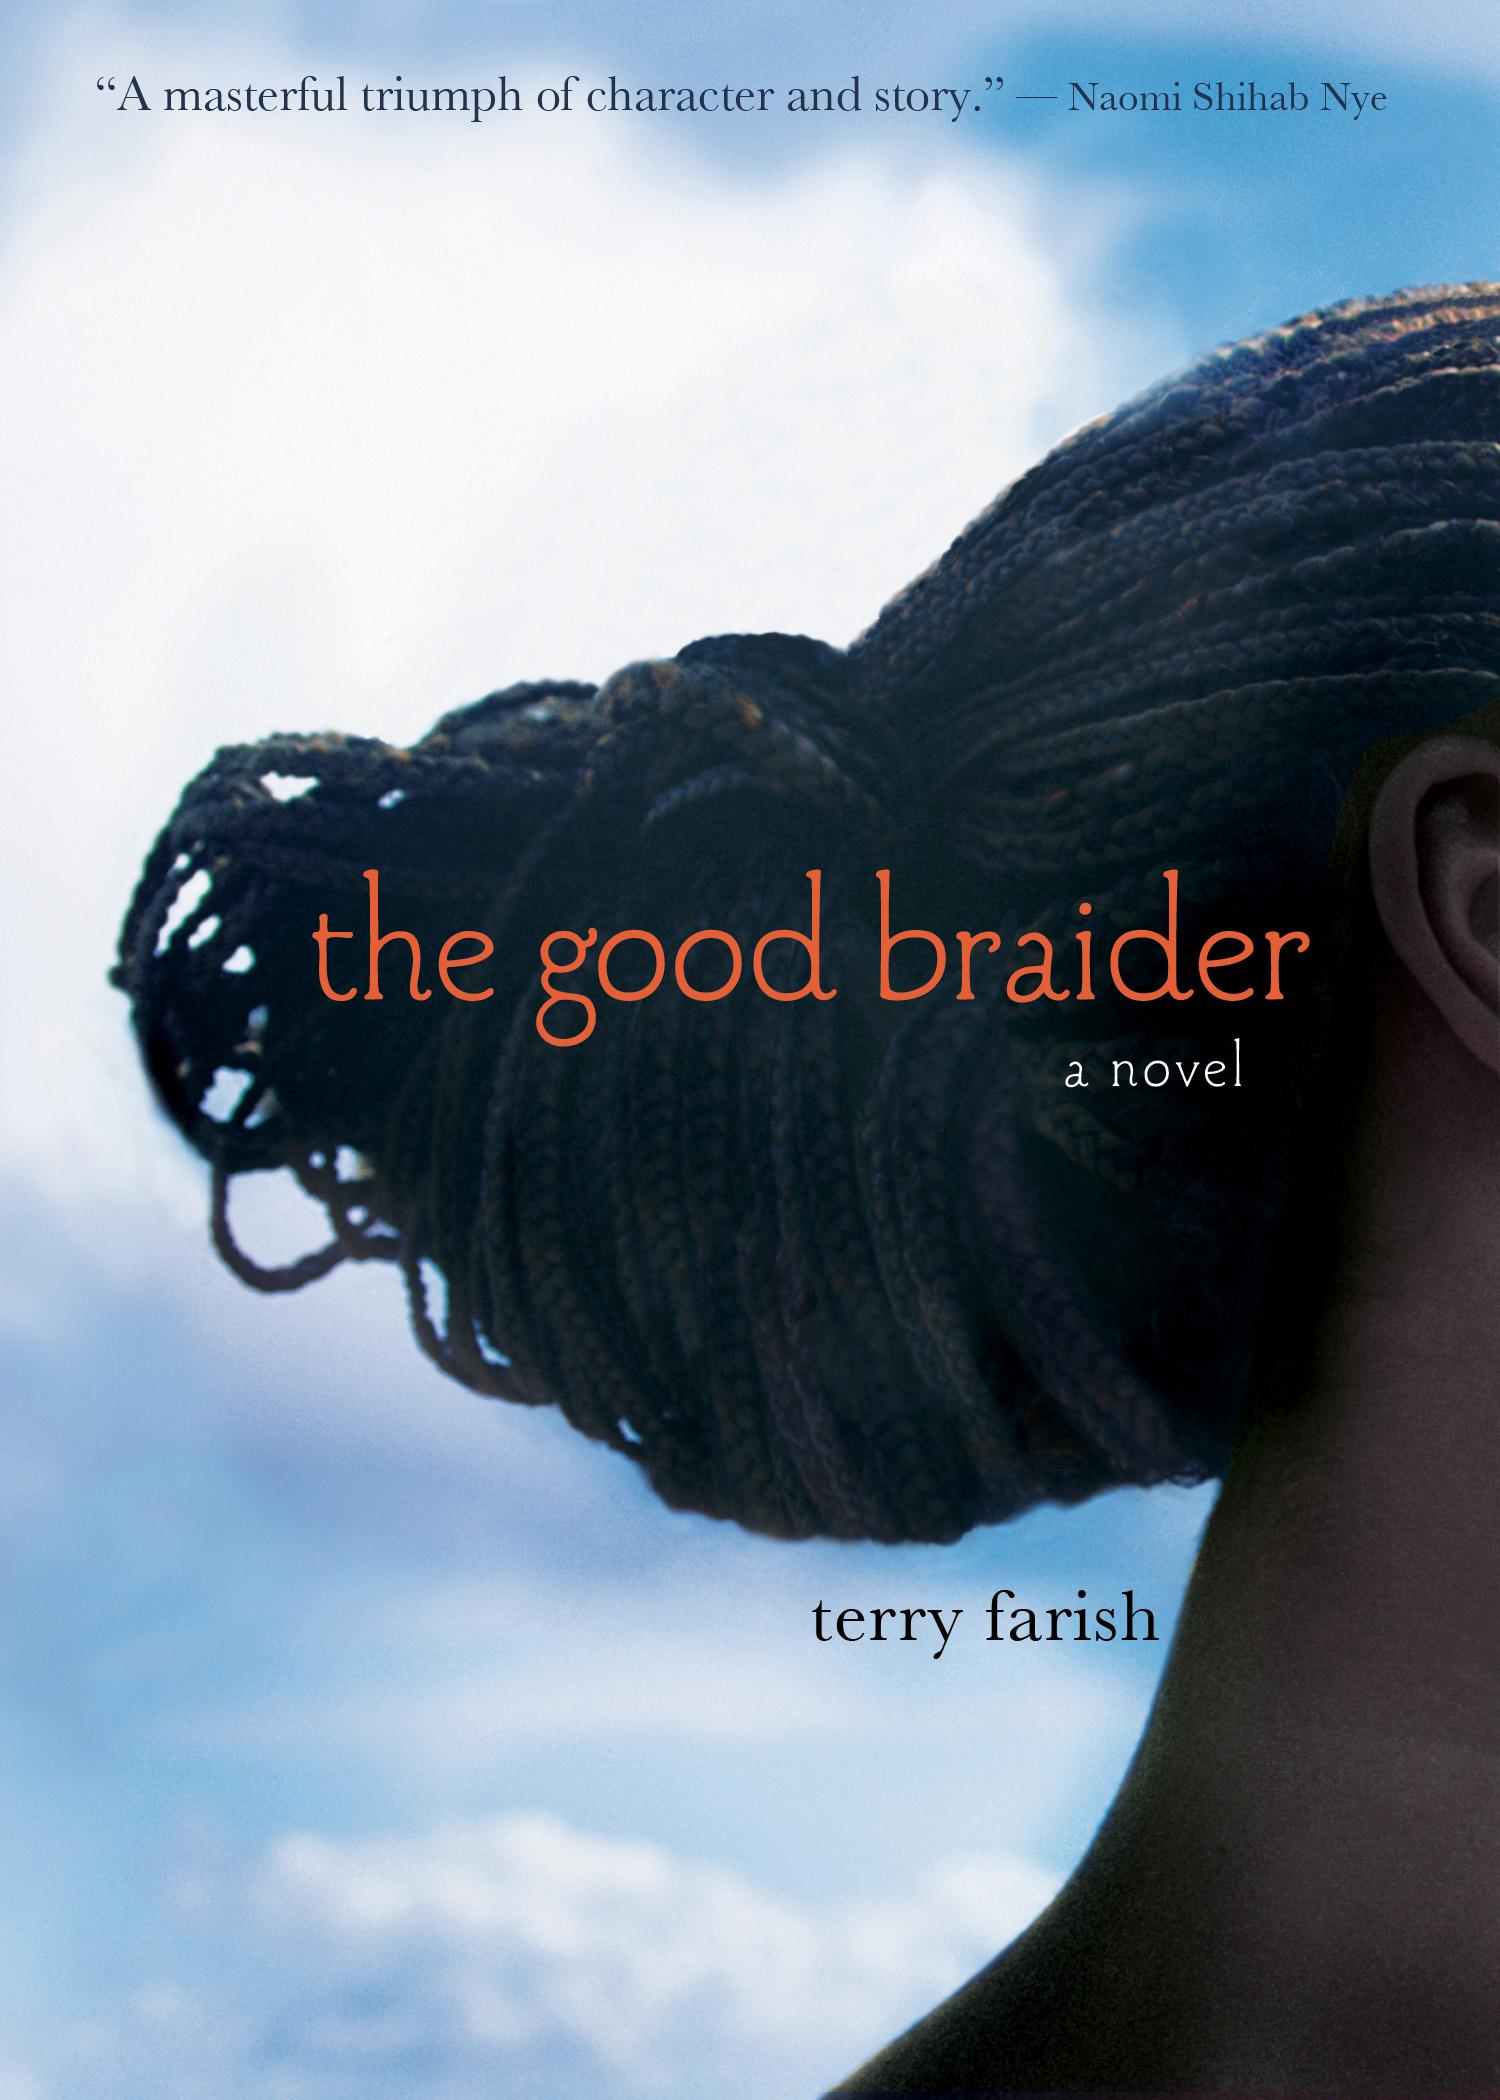 The Good Braider by Terry Farish  Amazon  |  Goodreads